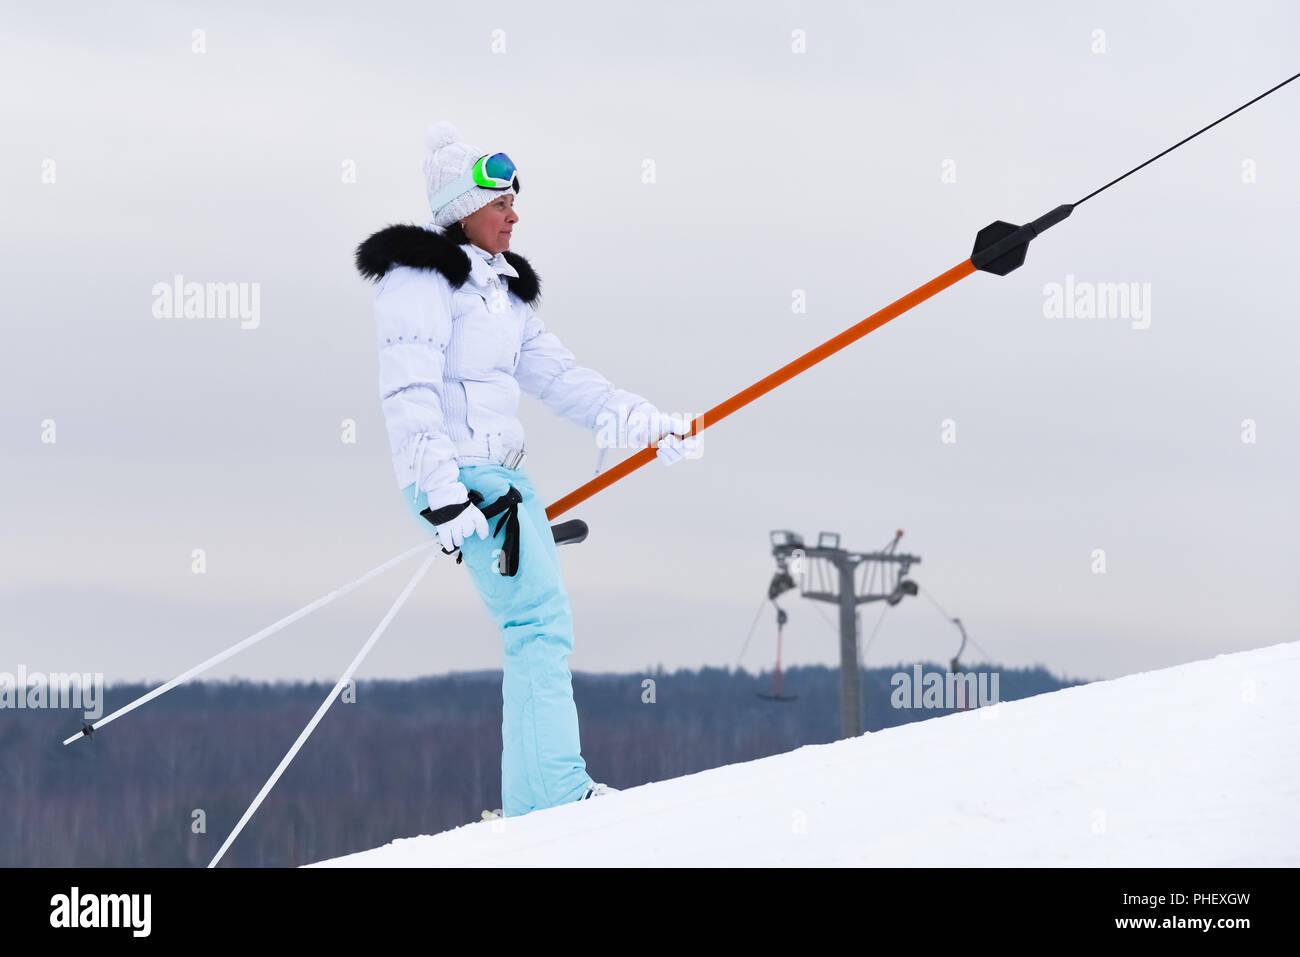 a woman skiing a mountain resort on a ski lift - Stock Image